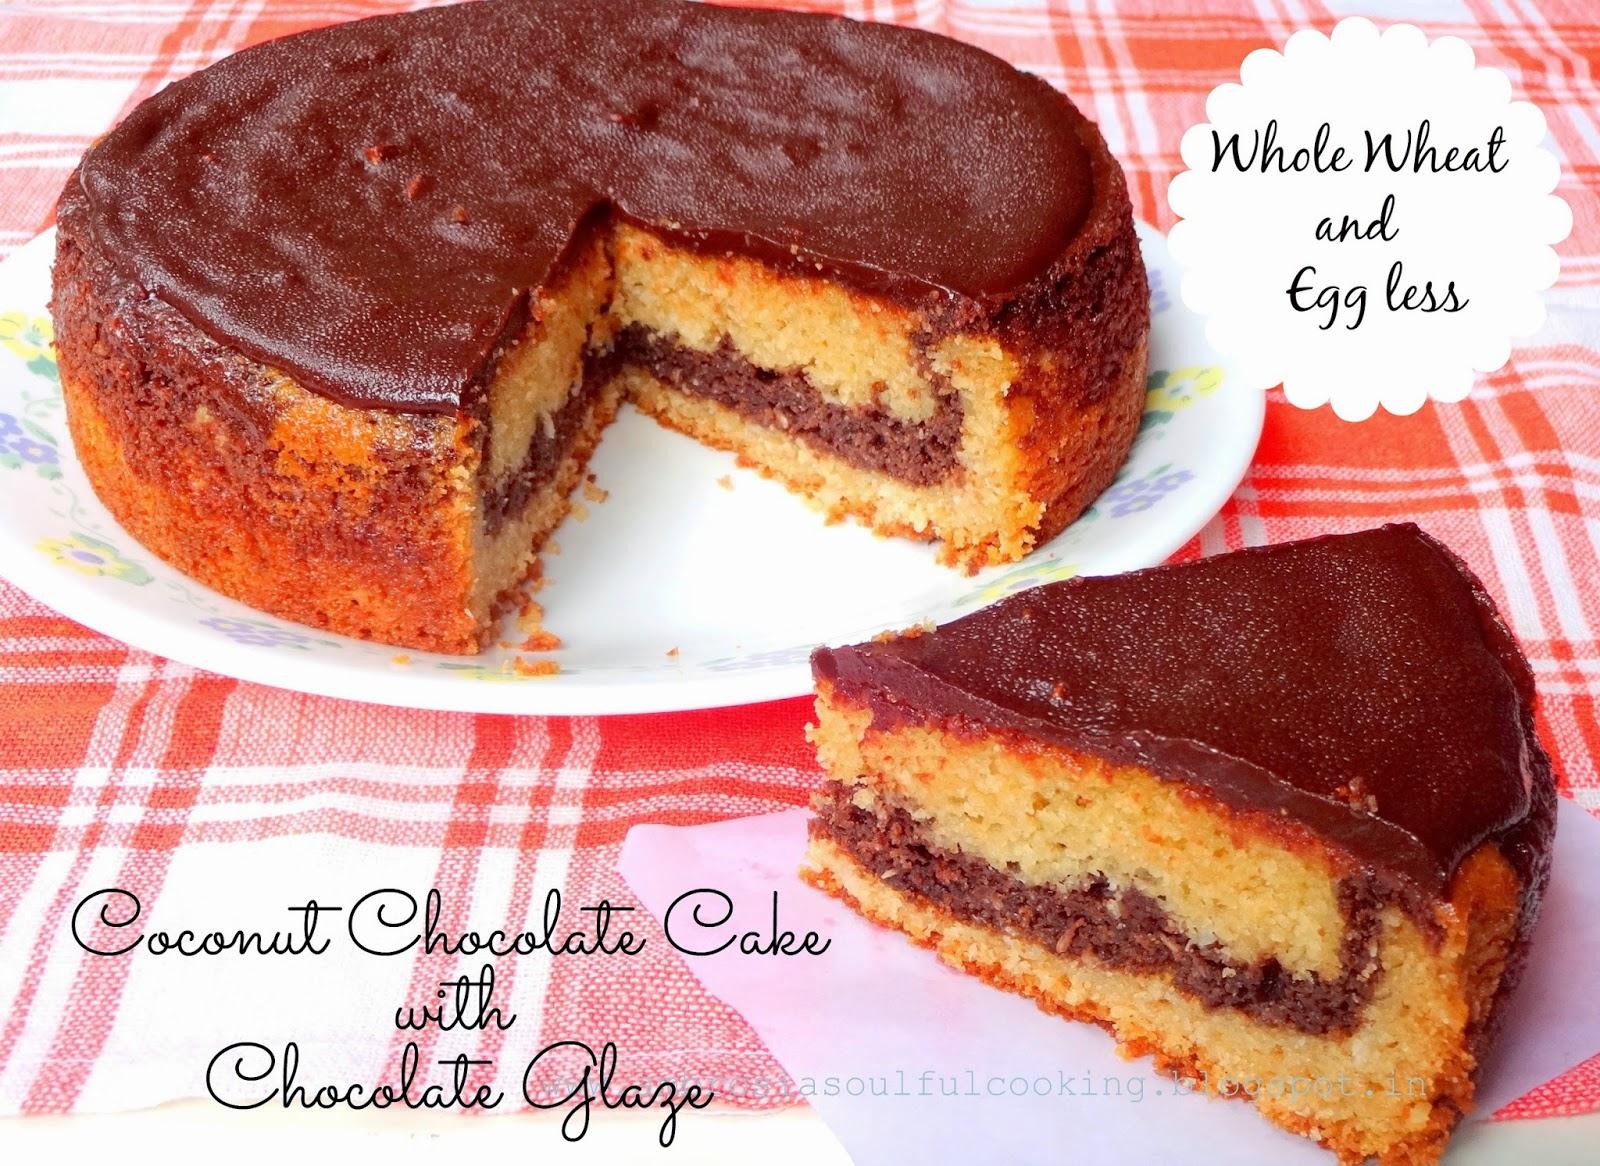 egg less coconut chocolate cake with chocolate glaze (whole wheat ...